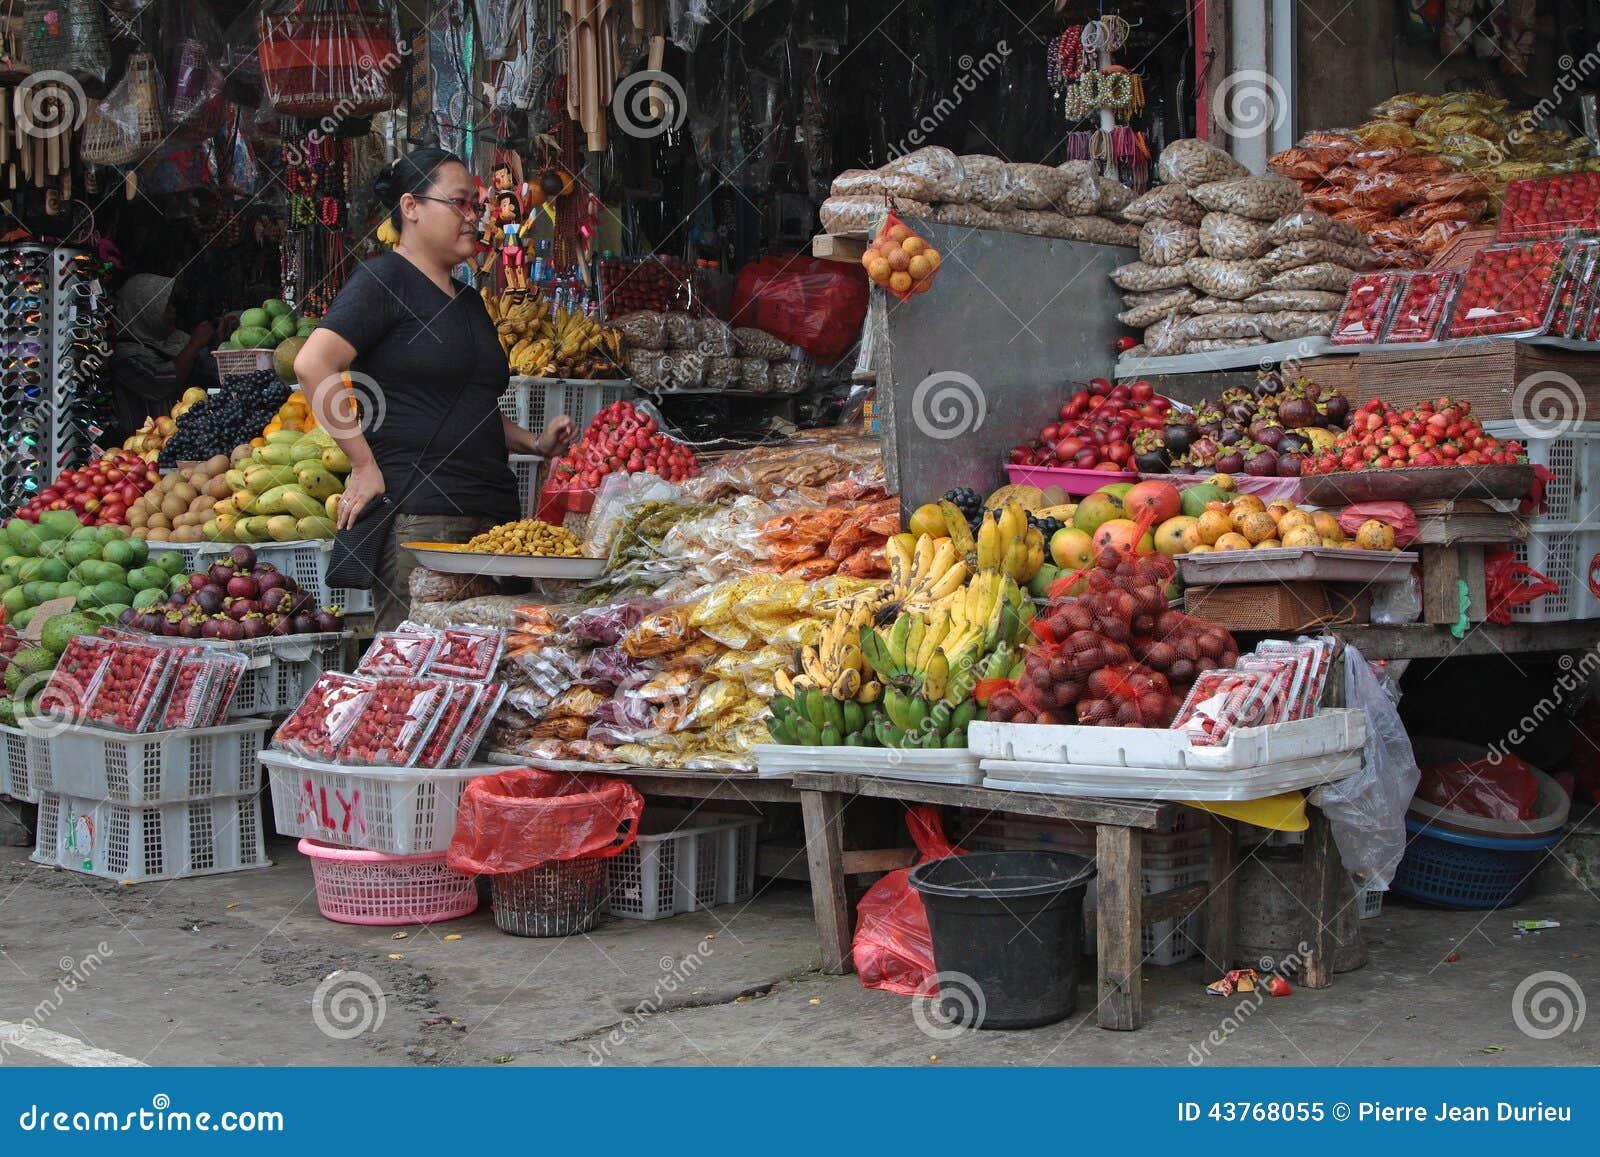 Bedugul Market Store Editorial Image Image Of People 43768055